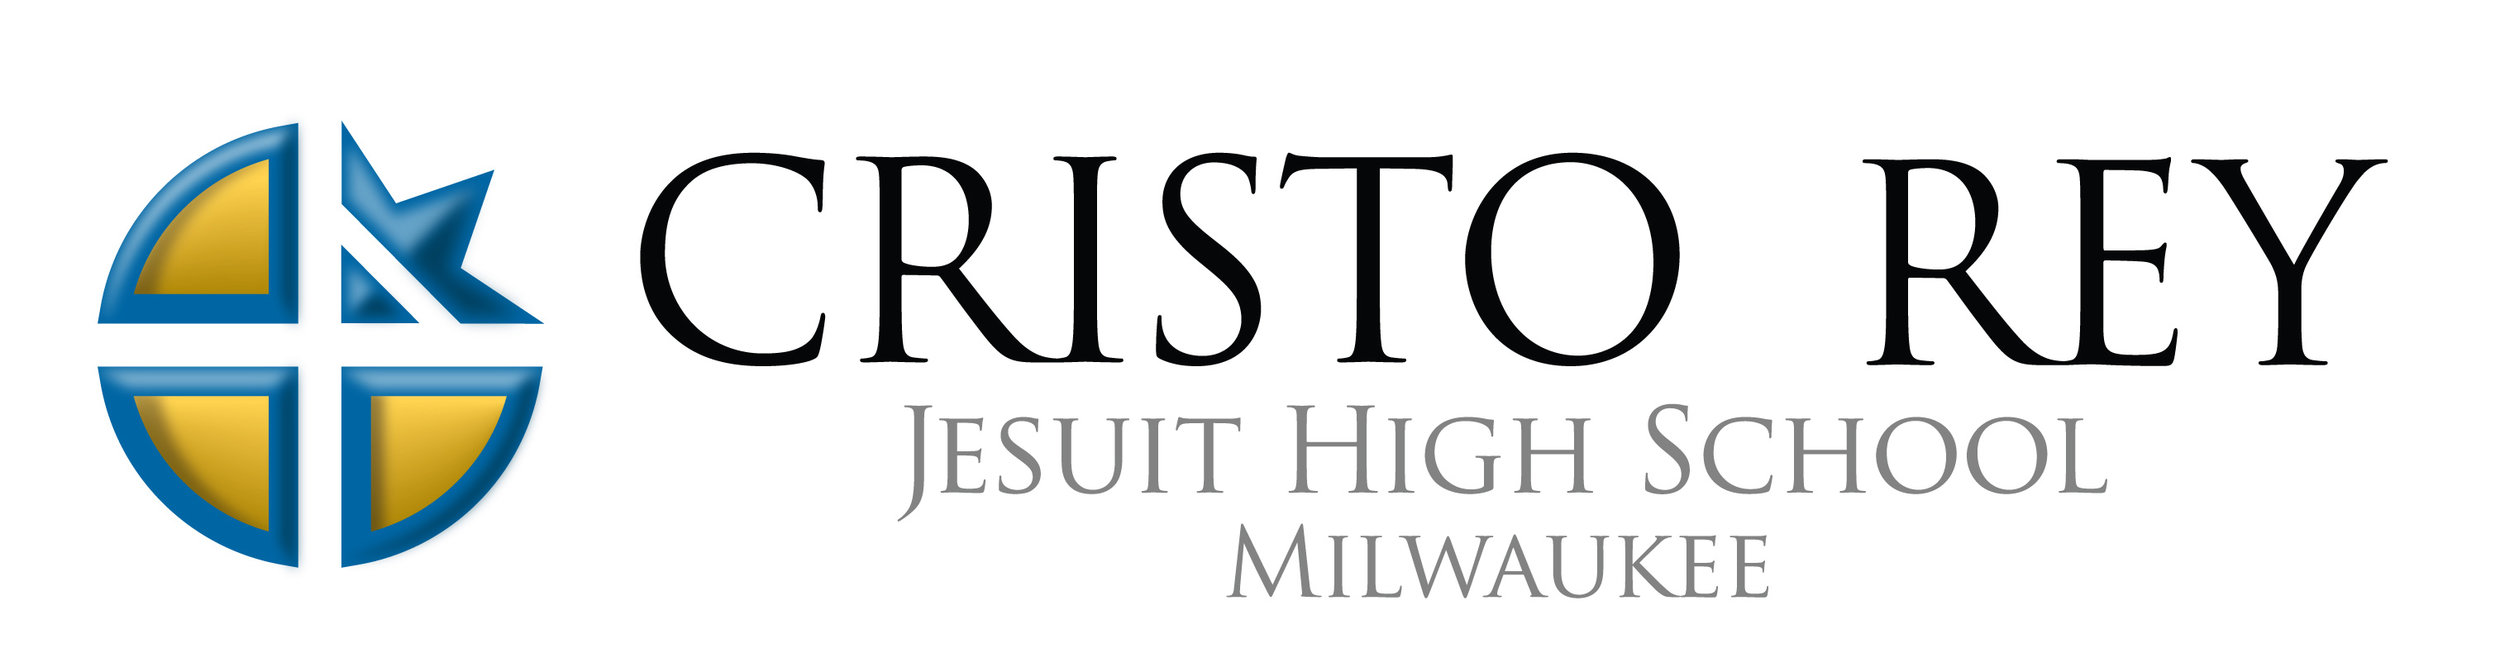 Cristo-Rey-Jesuit-HS-Milwaukee-logo.jpg